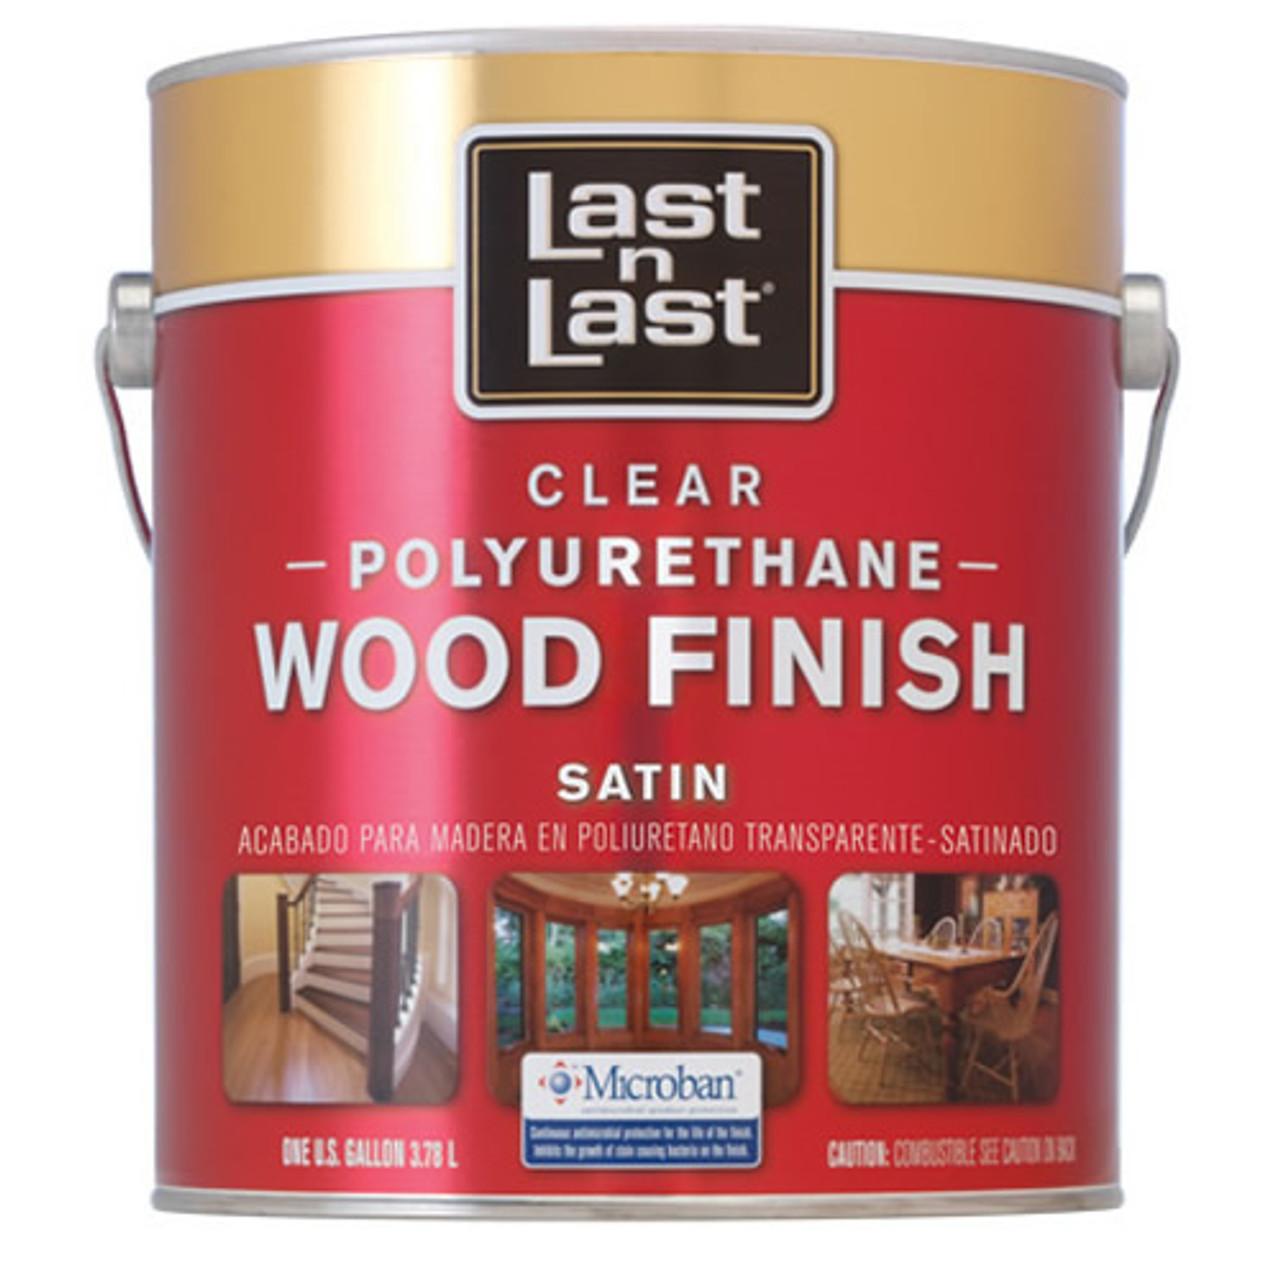 Last N Last Oil-Based Clear Polyrethane Wood Finish Satin